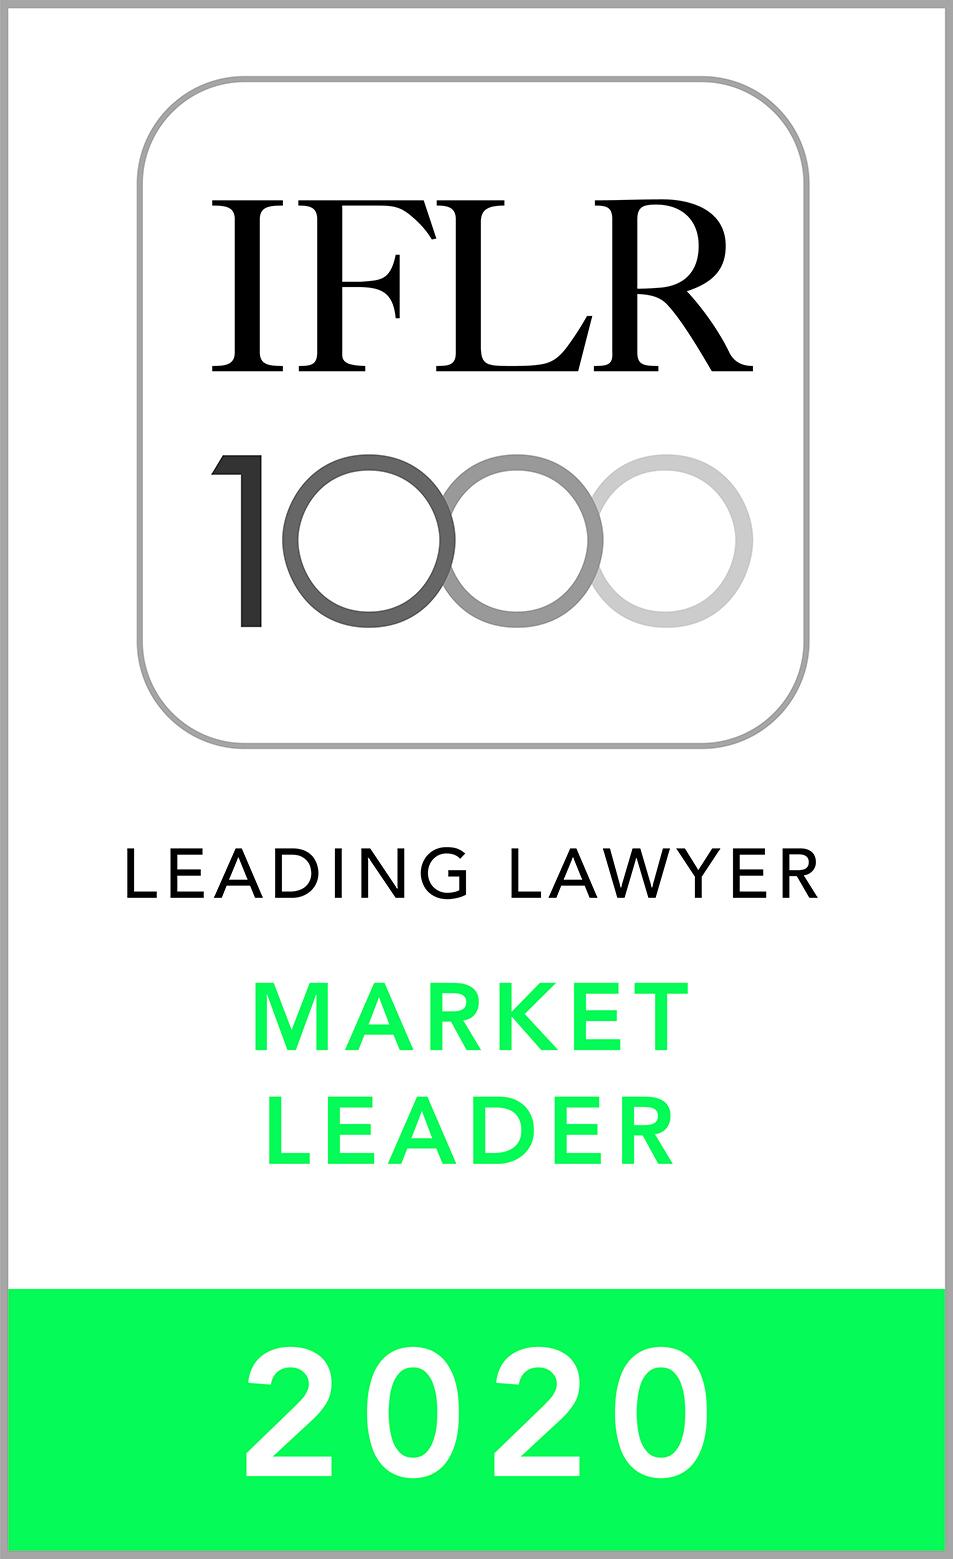 IFLR Market Leader 2020